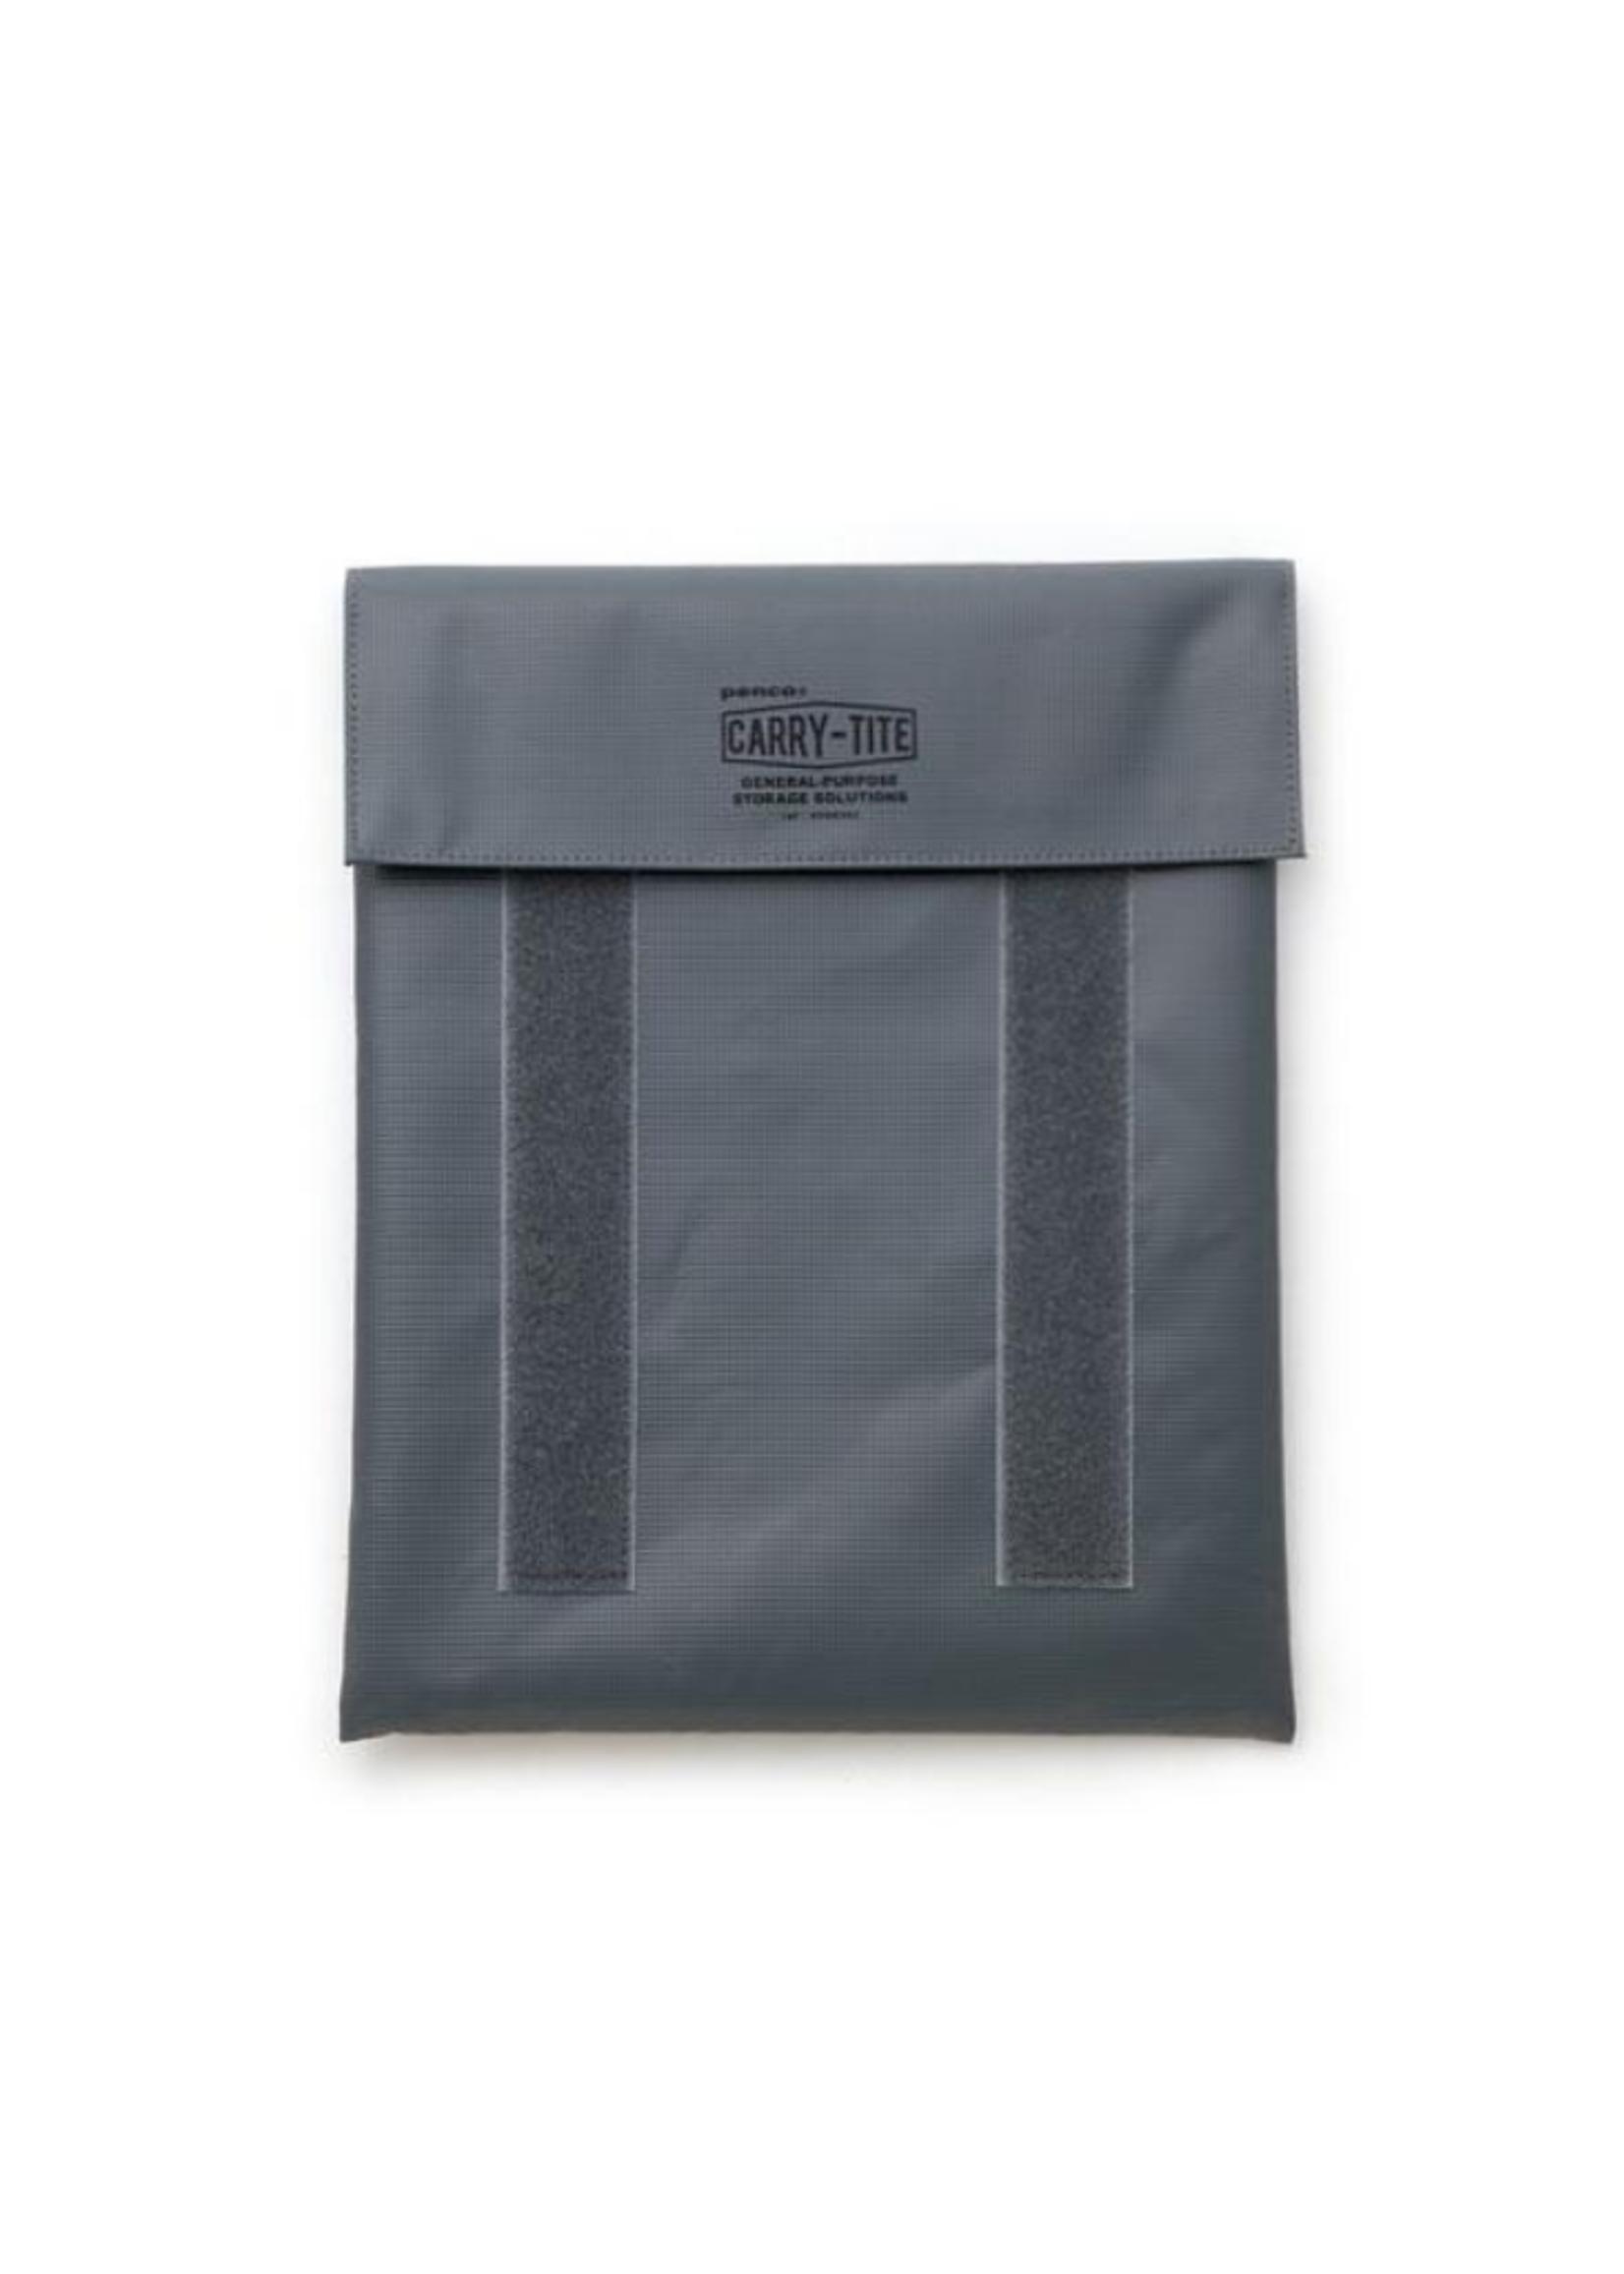 Hightide USA Carry Tite Laptop Case Gray